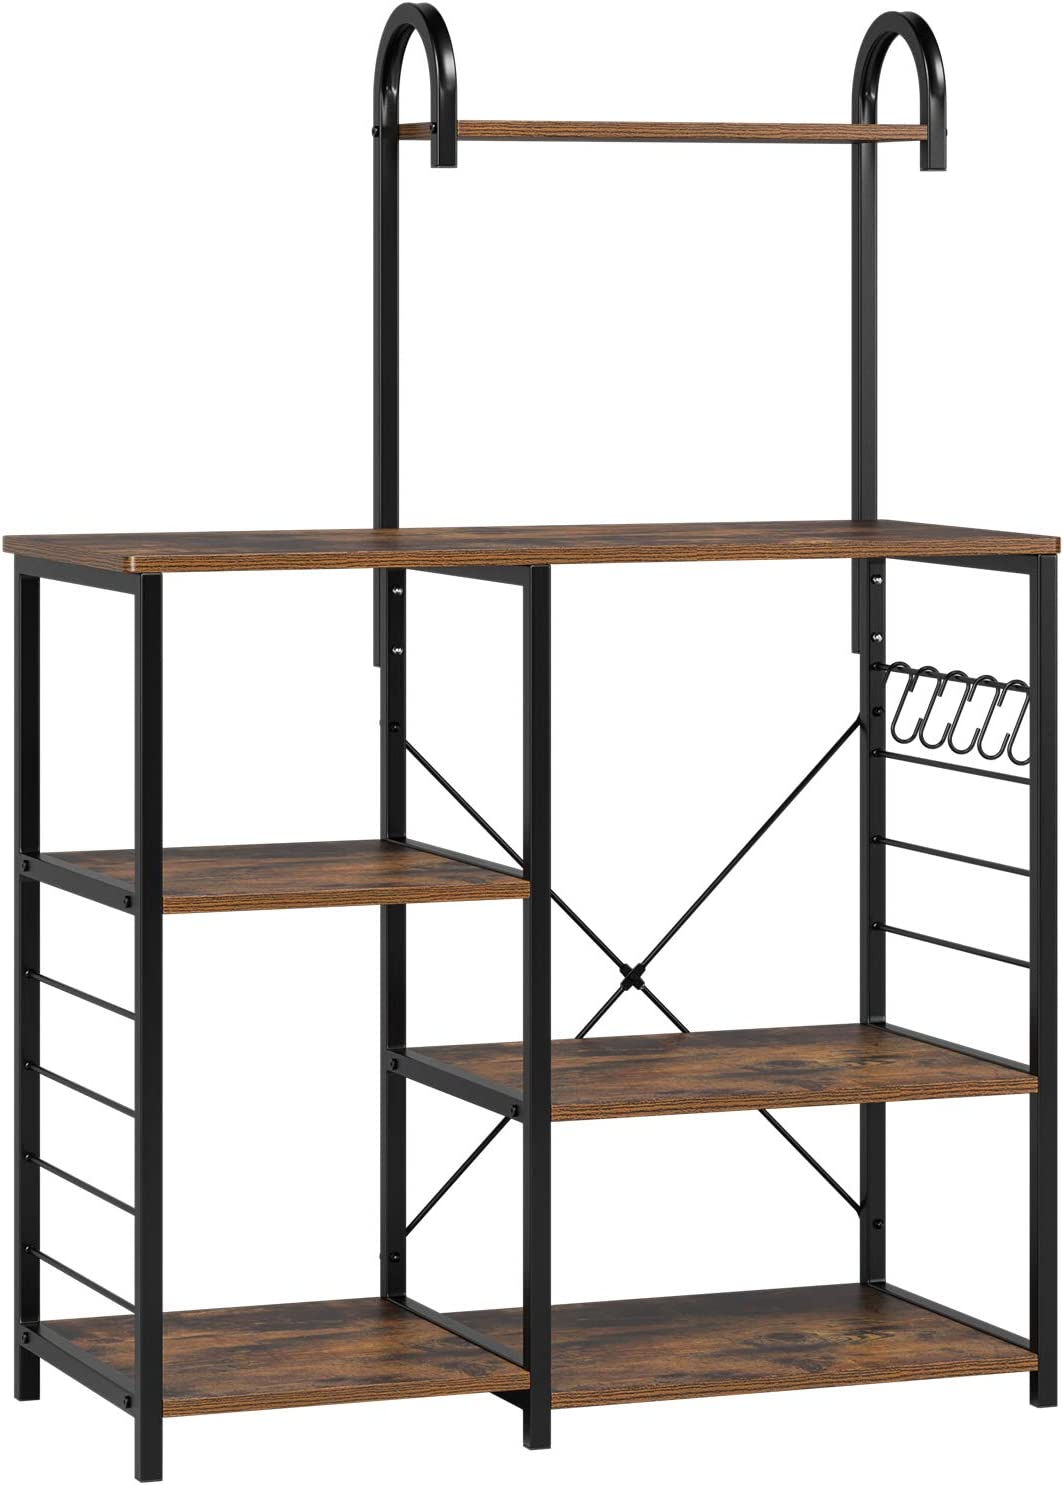 Homfa Kitchen Baker's Rack with High Shelf, Vintage Microwave Stand Utility Storage Shelf Kitchen Island Rack 3-Tier and 4-Tier Multipurpose Organizer Workstation with 5 Hooks, 35.4Lx15.7Wx52H inch